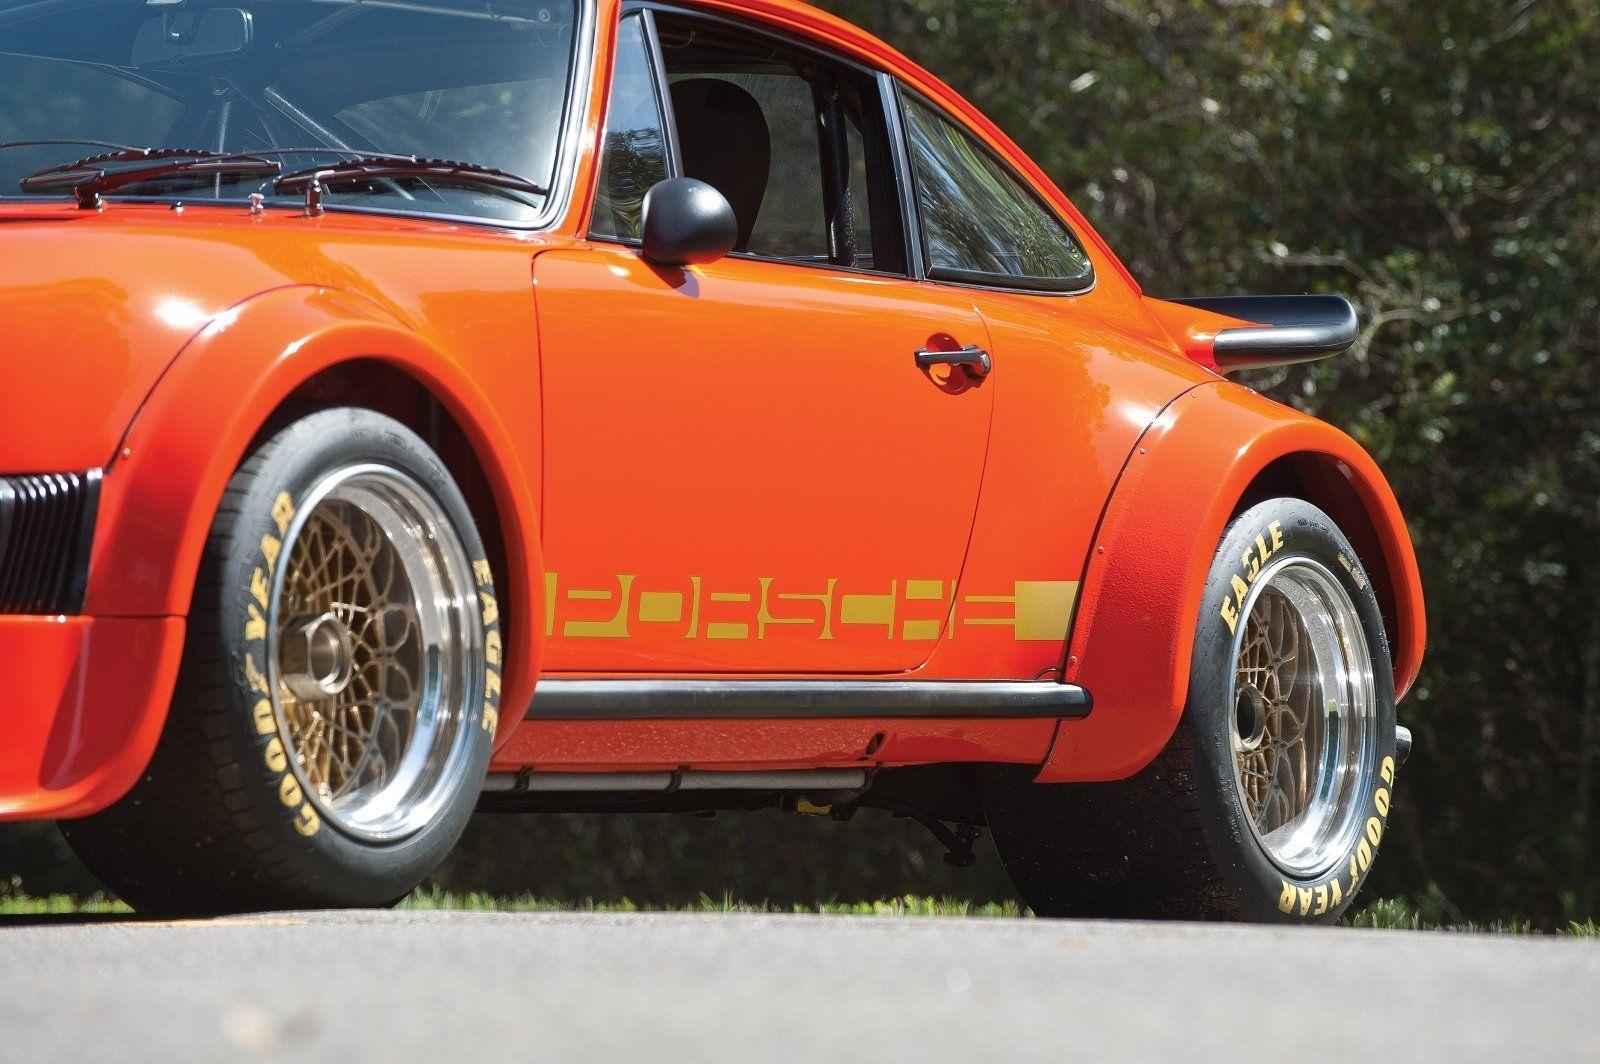 1976 Porsche 934 Turbo Rsr Fia Gr 4 Top Speed Porsche Classic Porsche Turbo